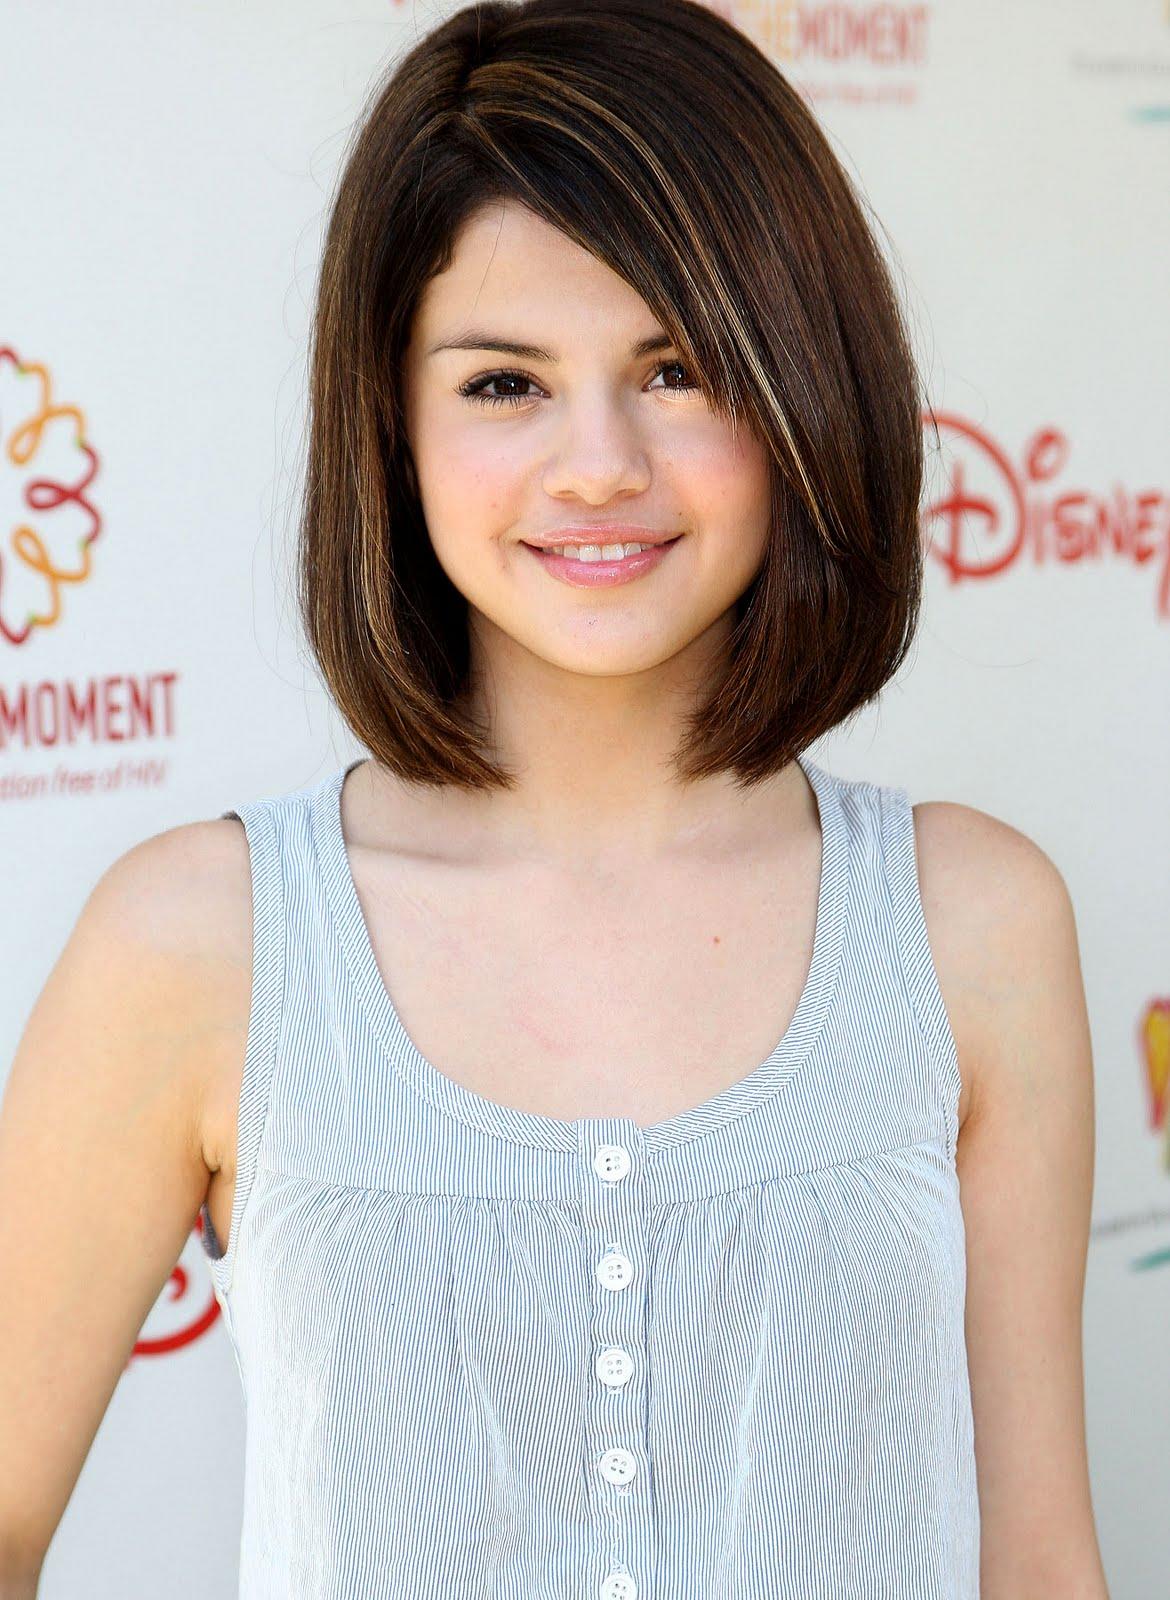 Incredible Short Hair Styles Selena Gomez Hairstyles Wallpapers Short Hairstyles For Black Women Fulllsitofus